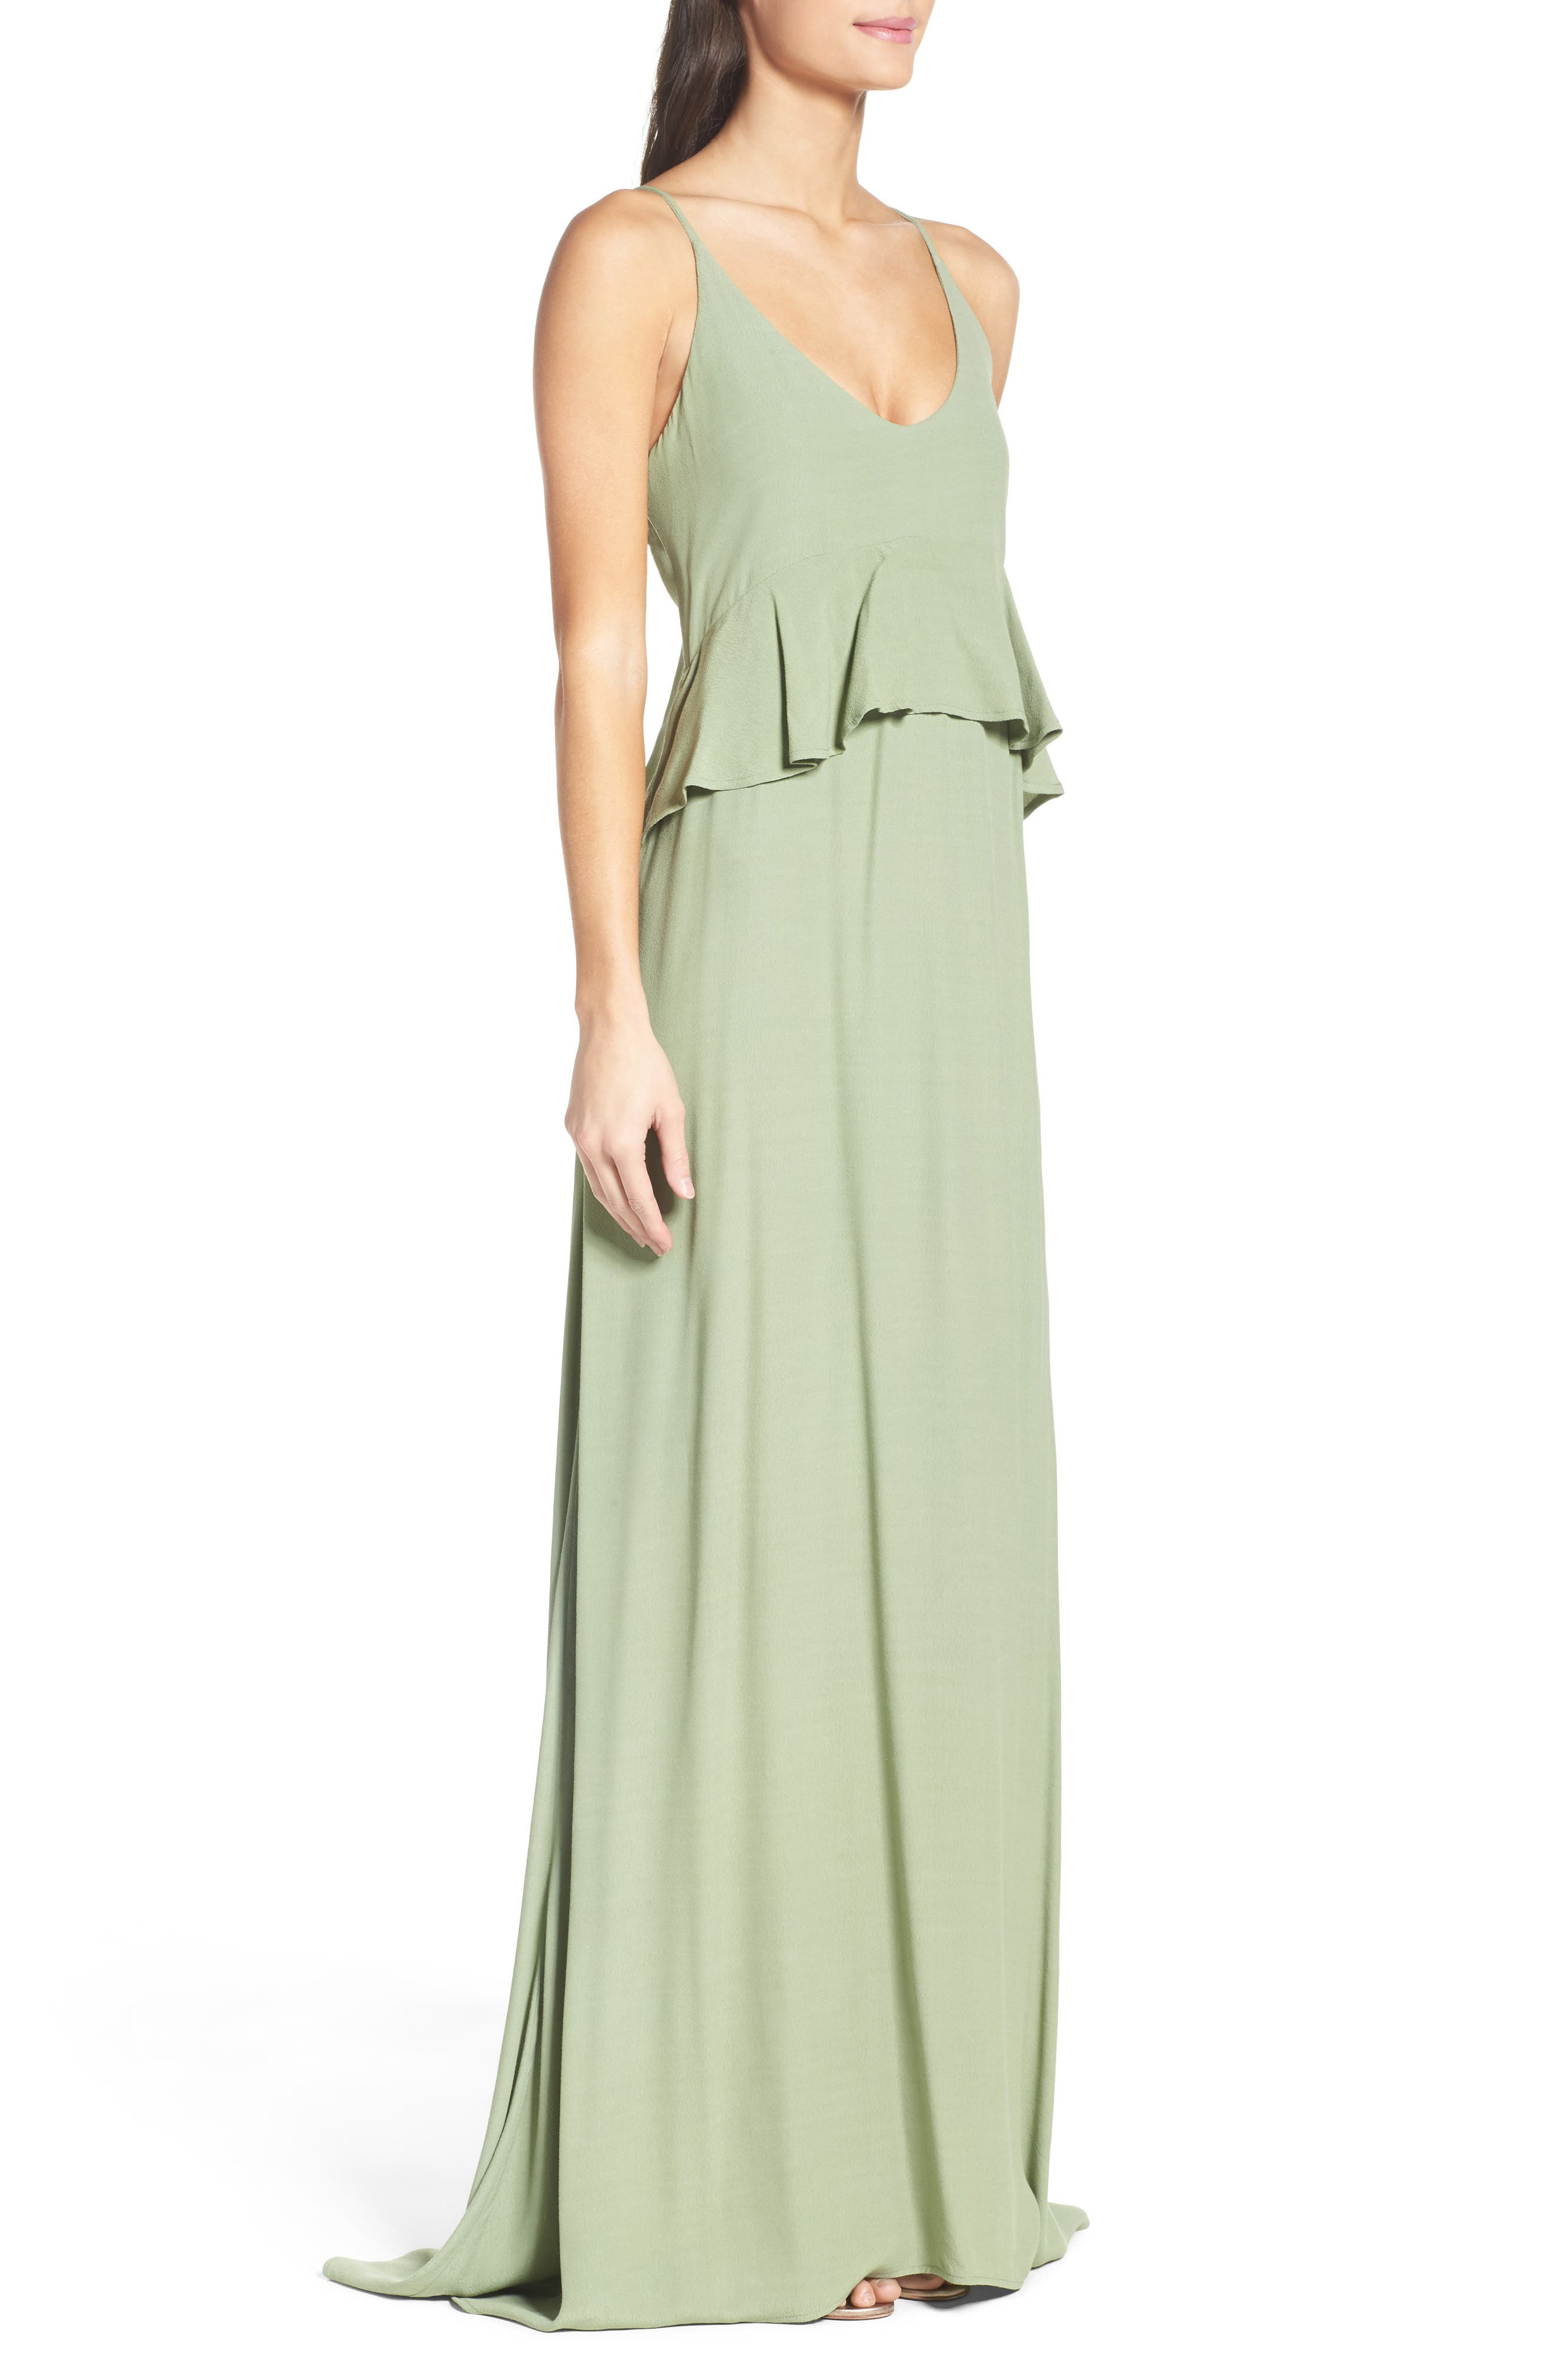 Roe + May Jolie Crepe Peplum Dress,                             Alternate thumbnail 5, color,